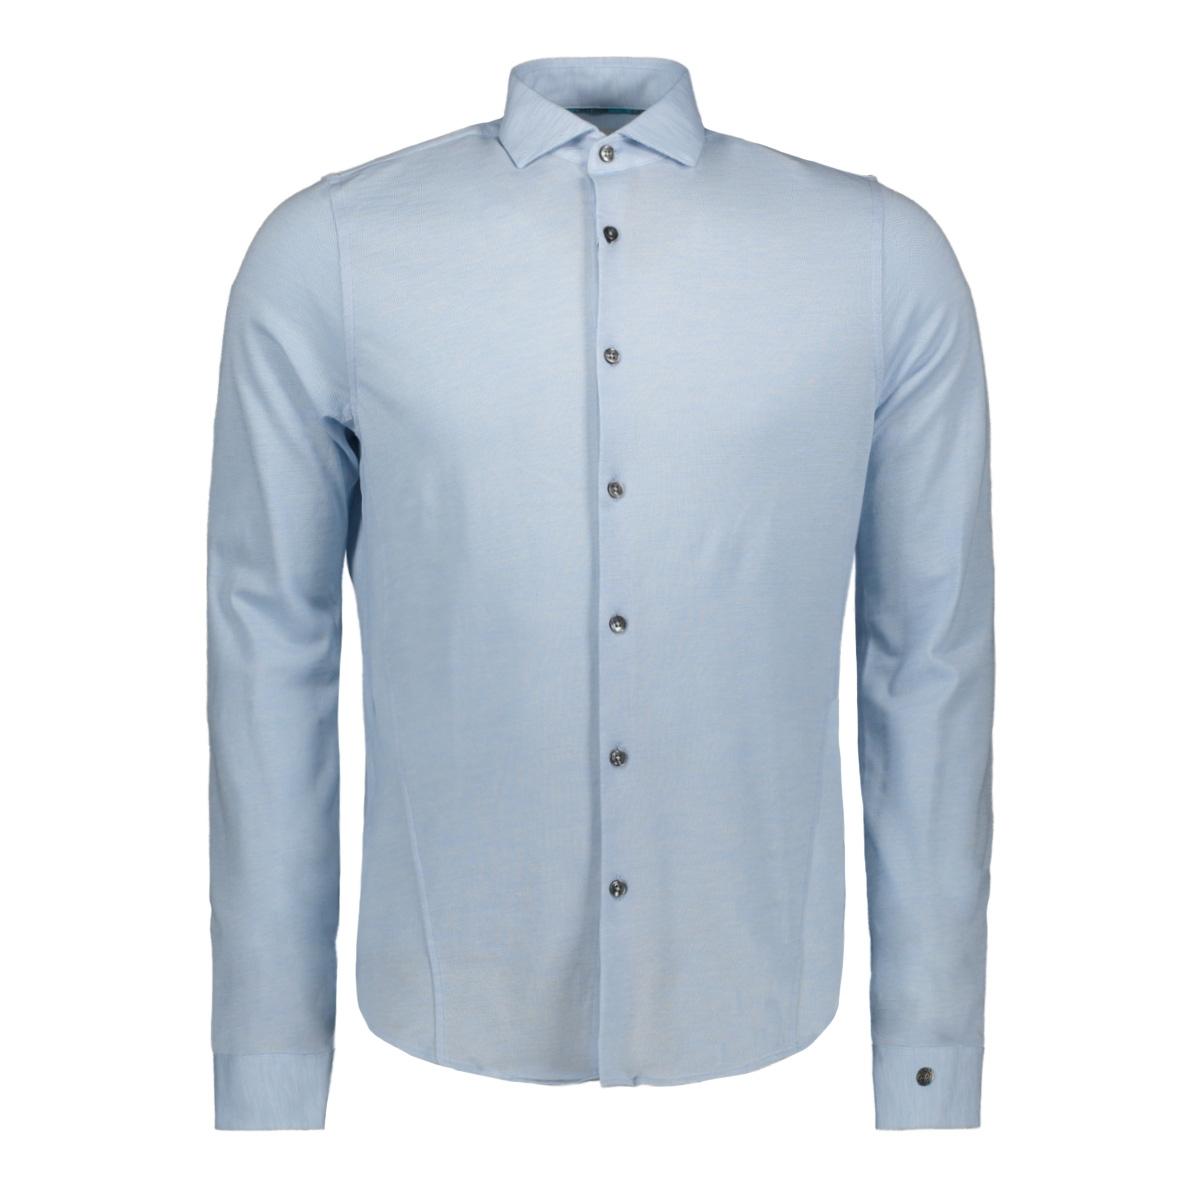 jersey slub pique shirt csi196616 cast iron overhemd 5300